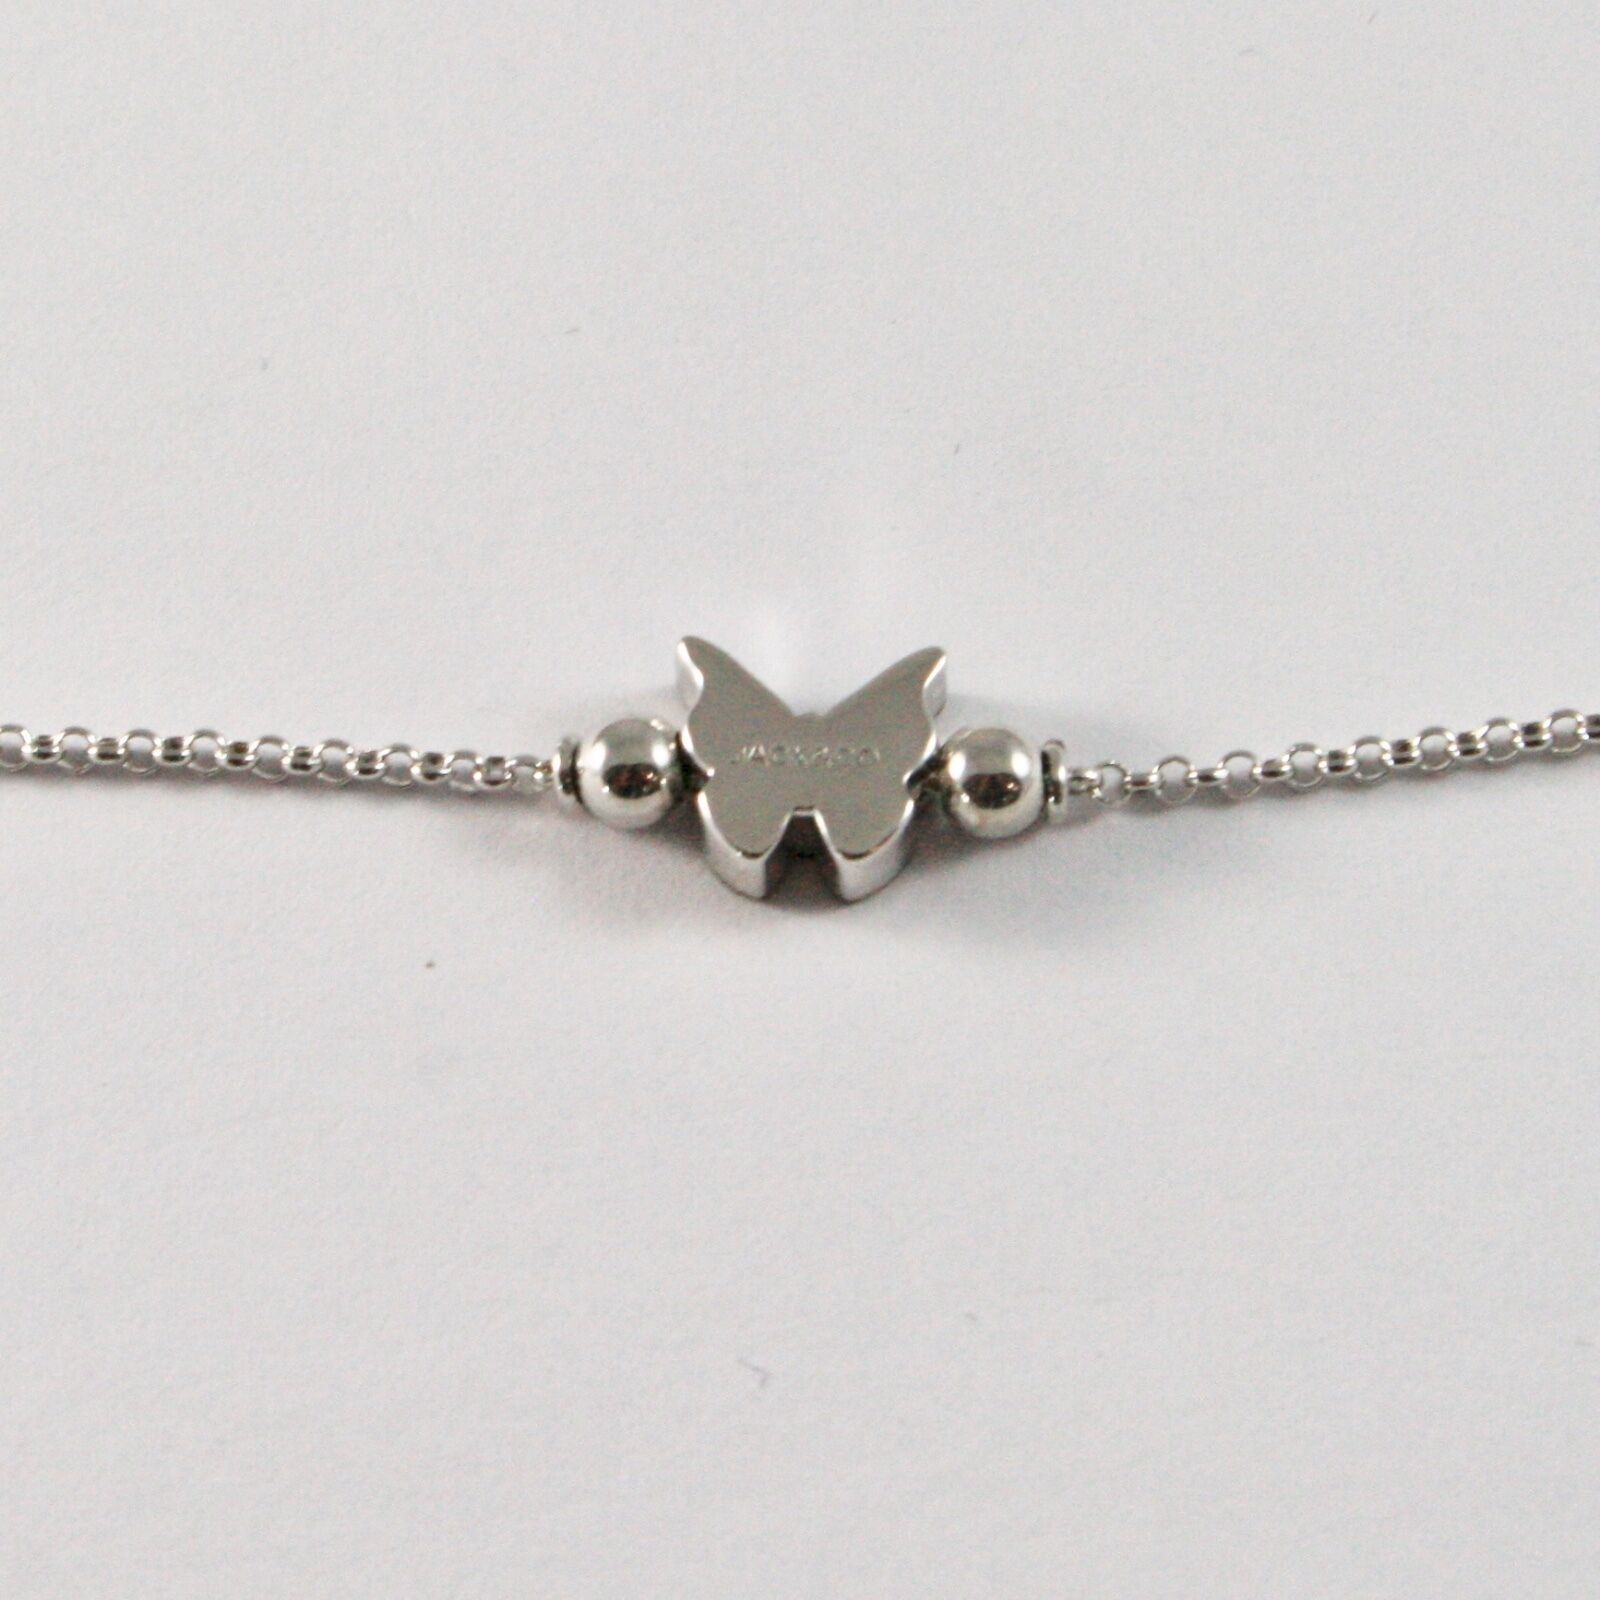 Silber Armband 925 Jack&co mit Schmetterling Stilisiert Zirkonia Cubic JCB0886 image 3